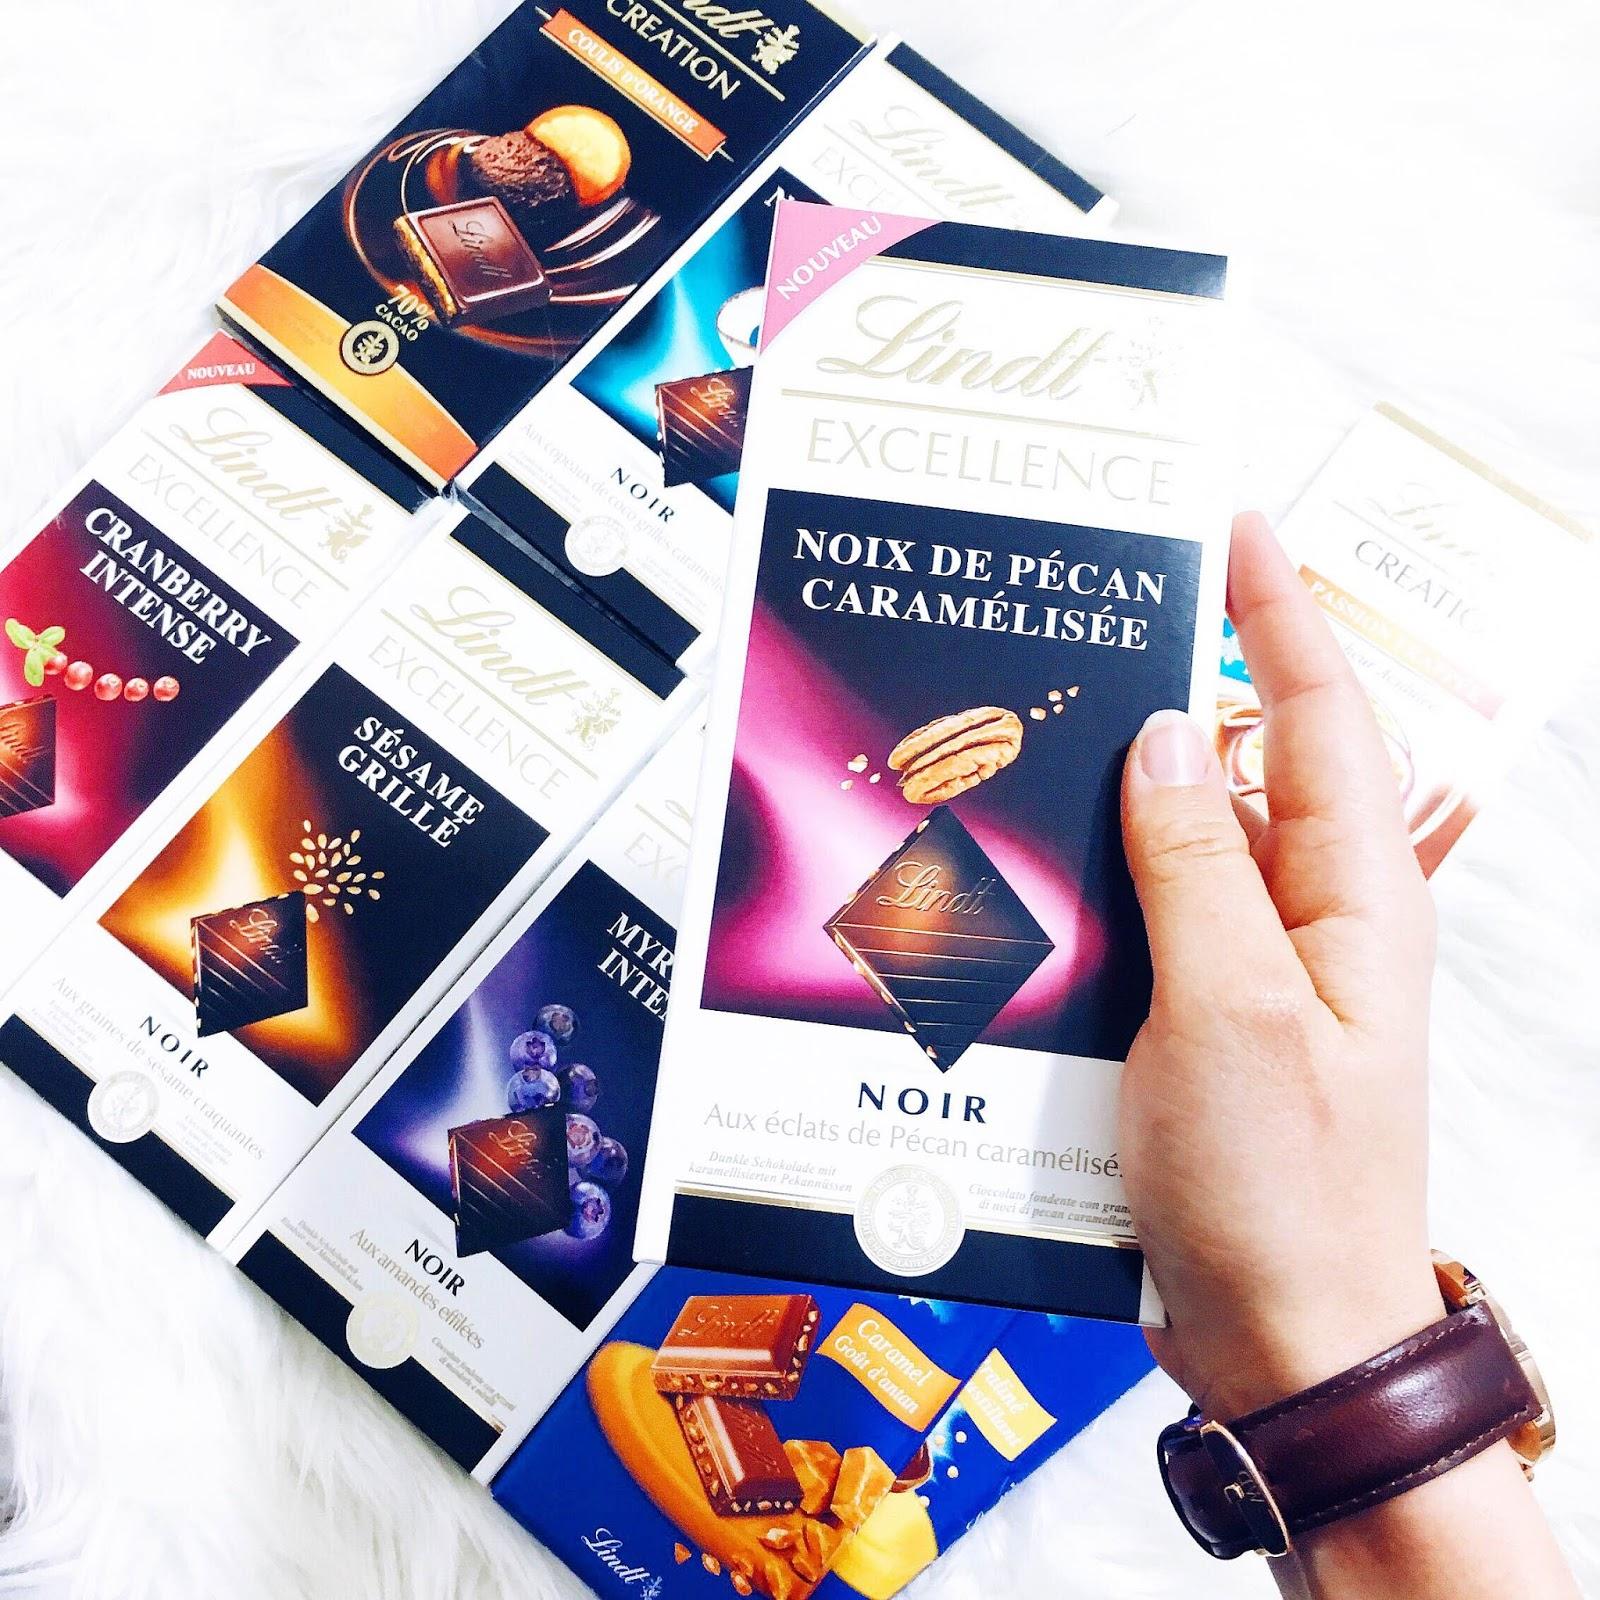 Lindt tablettes chocolat